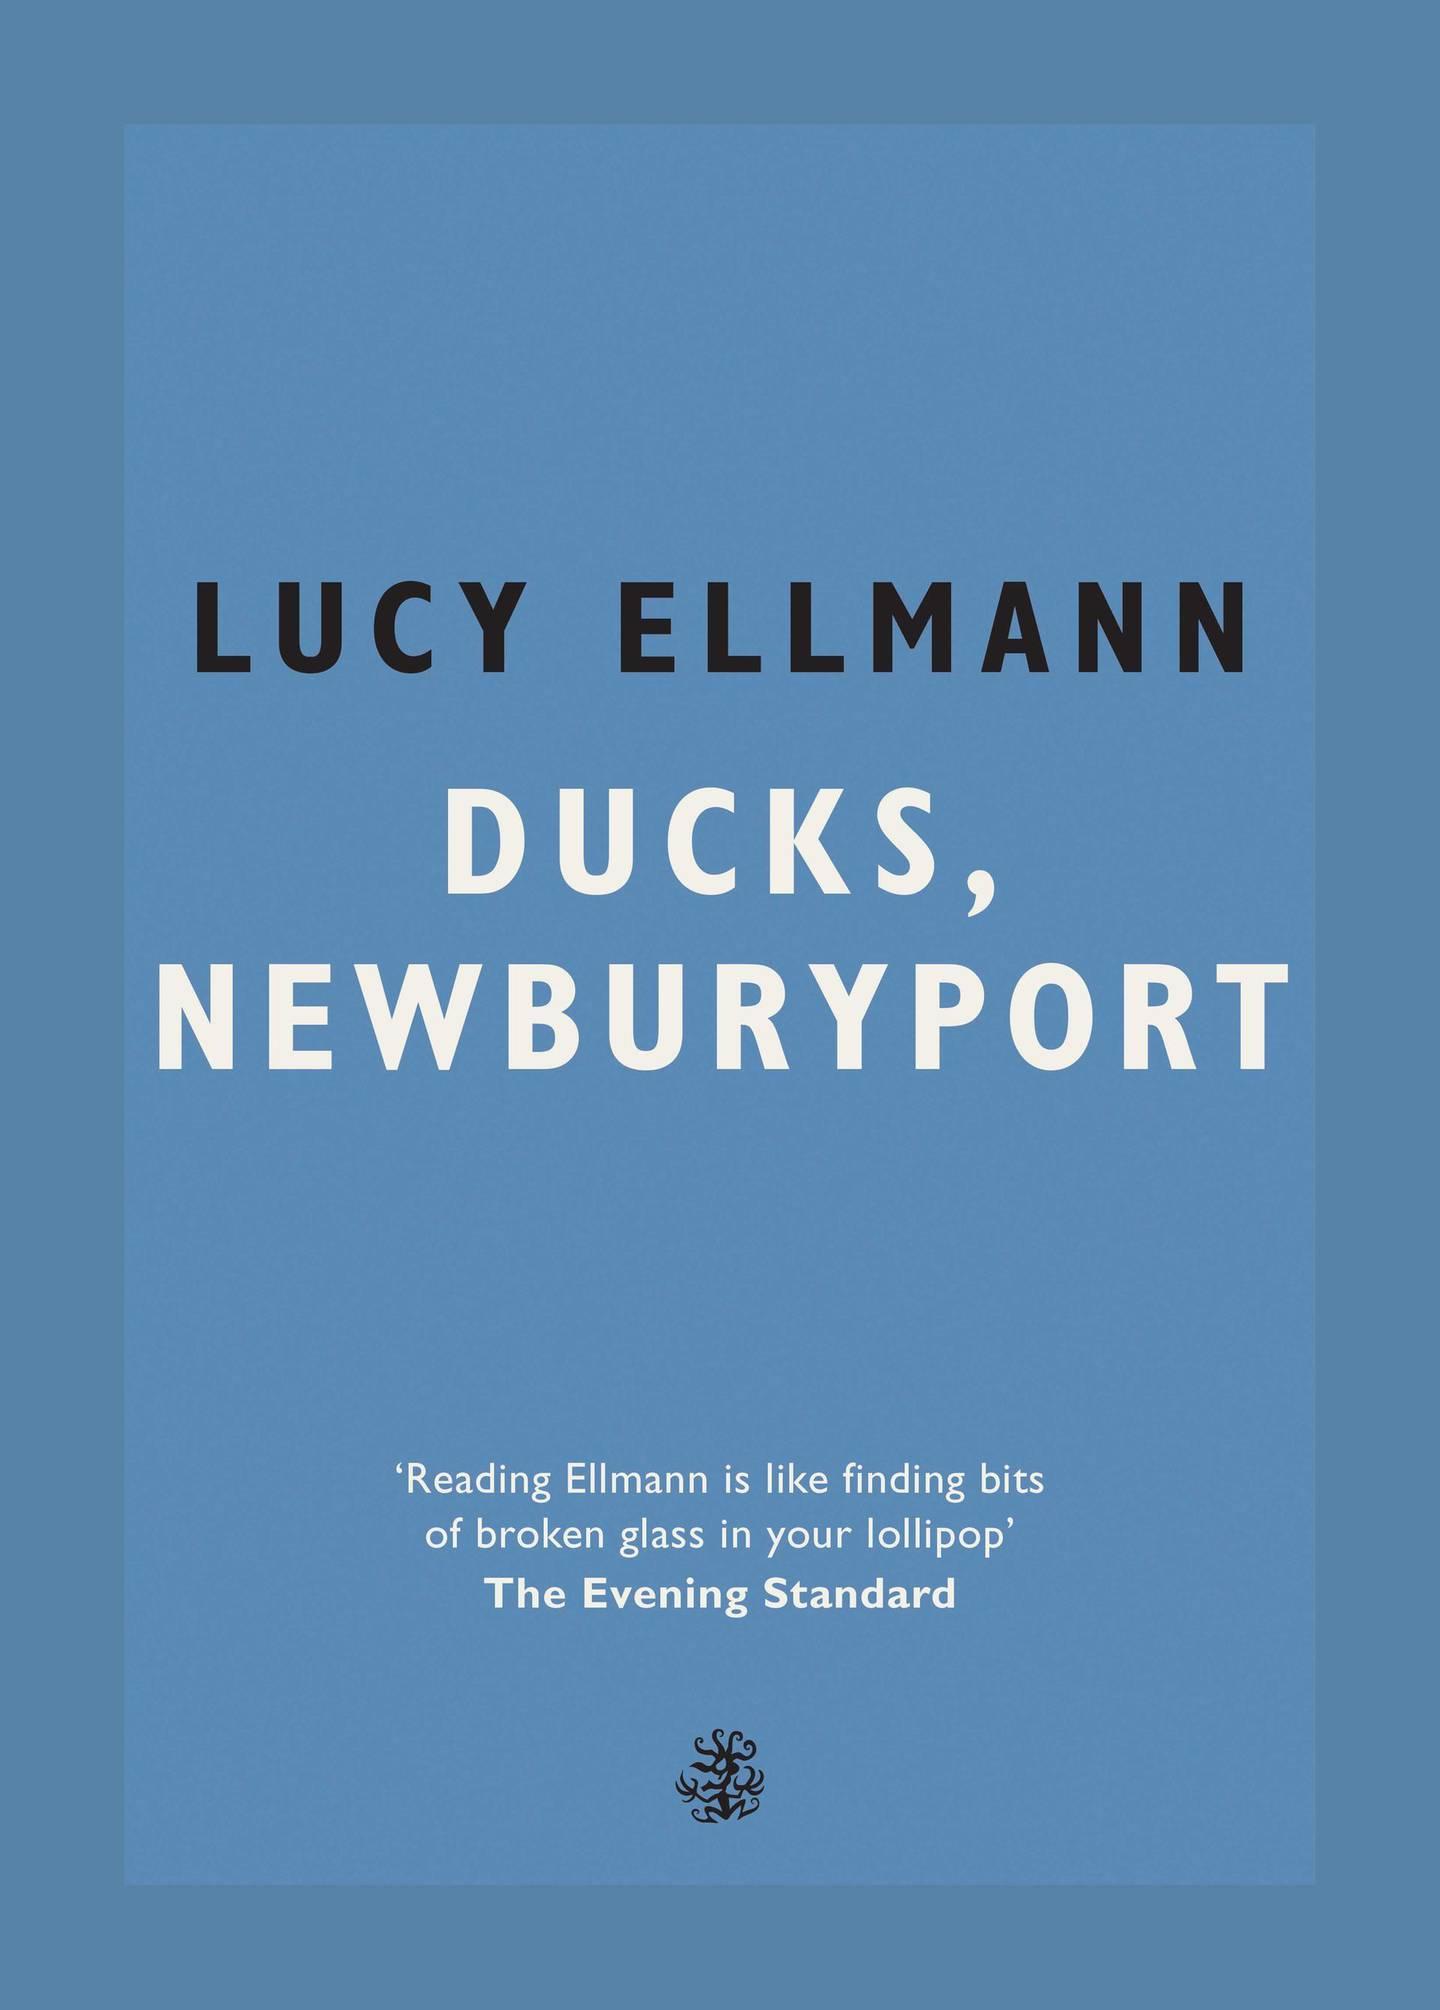 Ducks, Newburyport by Lucy Ellmann. Courtesy Galley Beggar Press